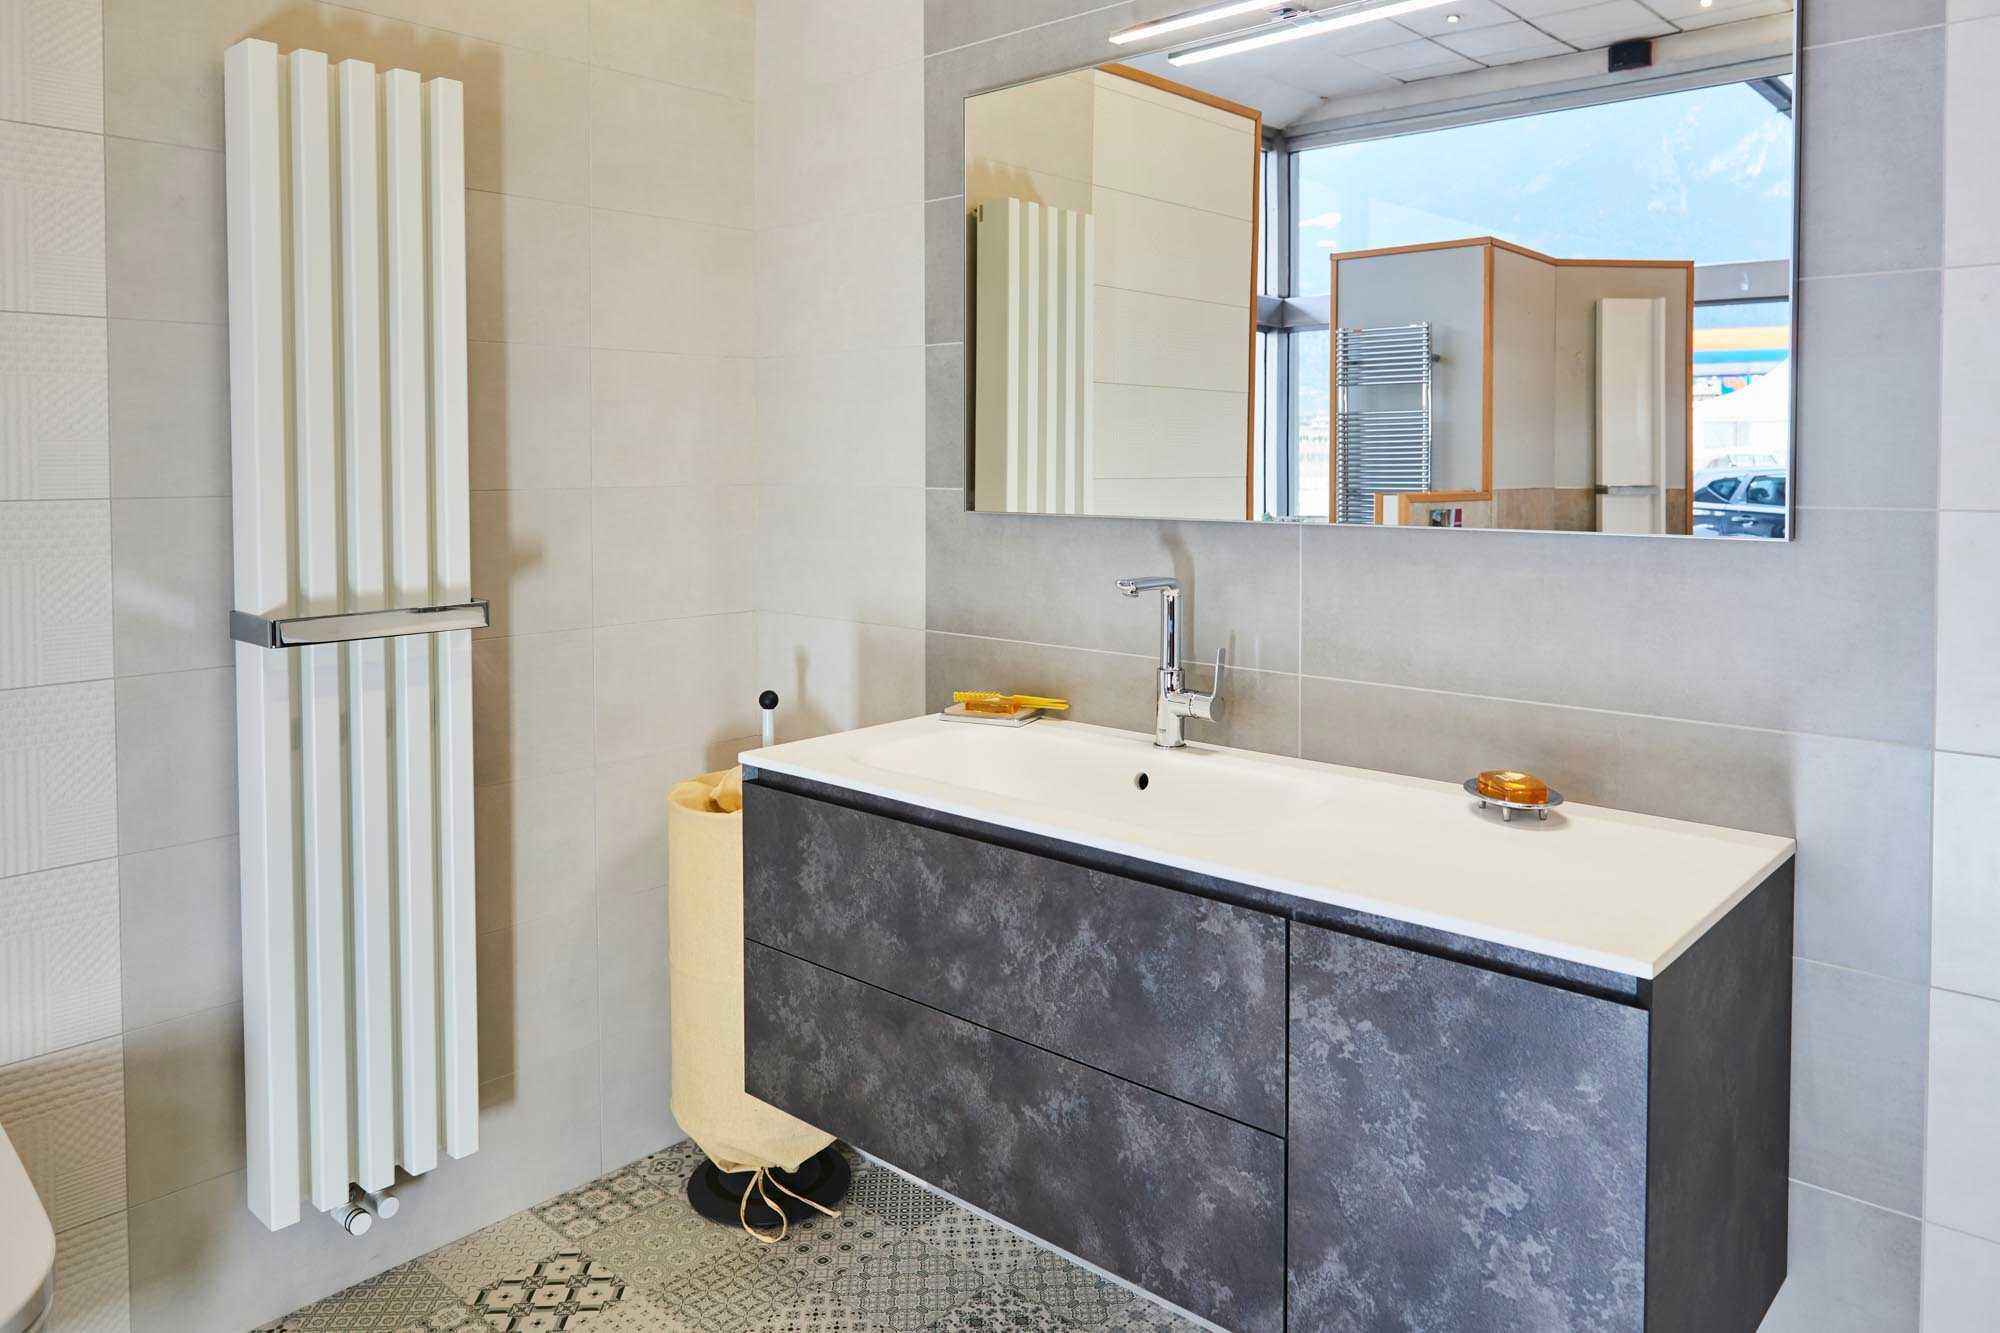 Showroom SVAI_Corrubbio_arredobagno moderno